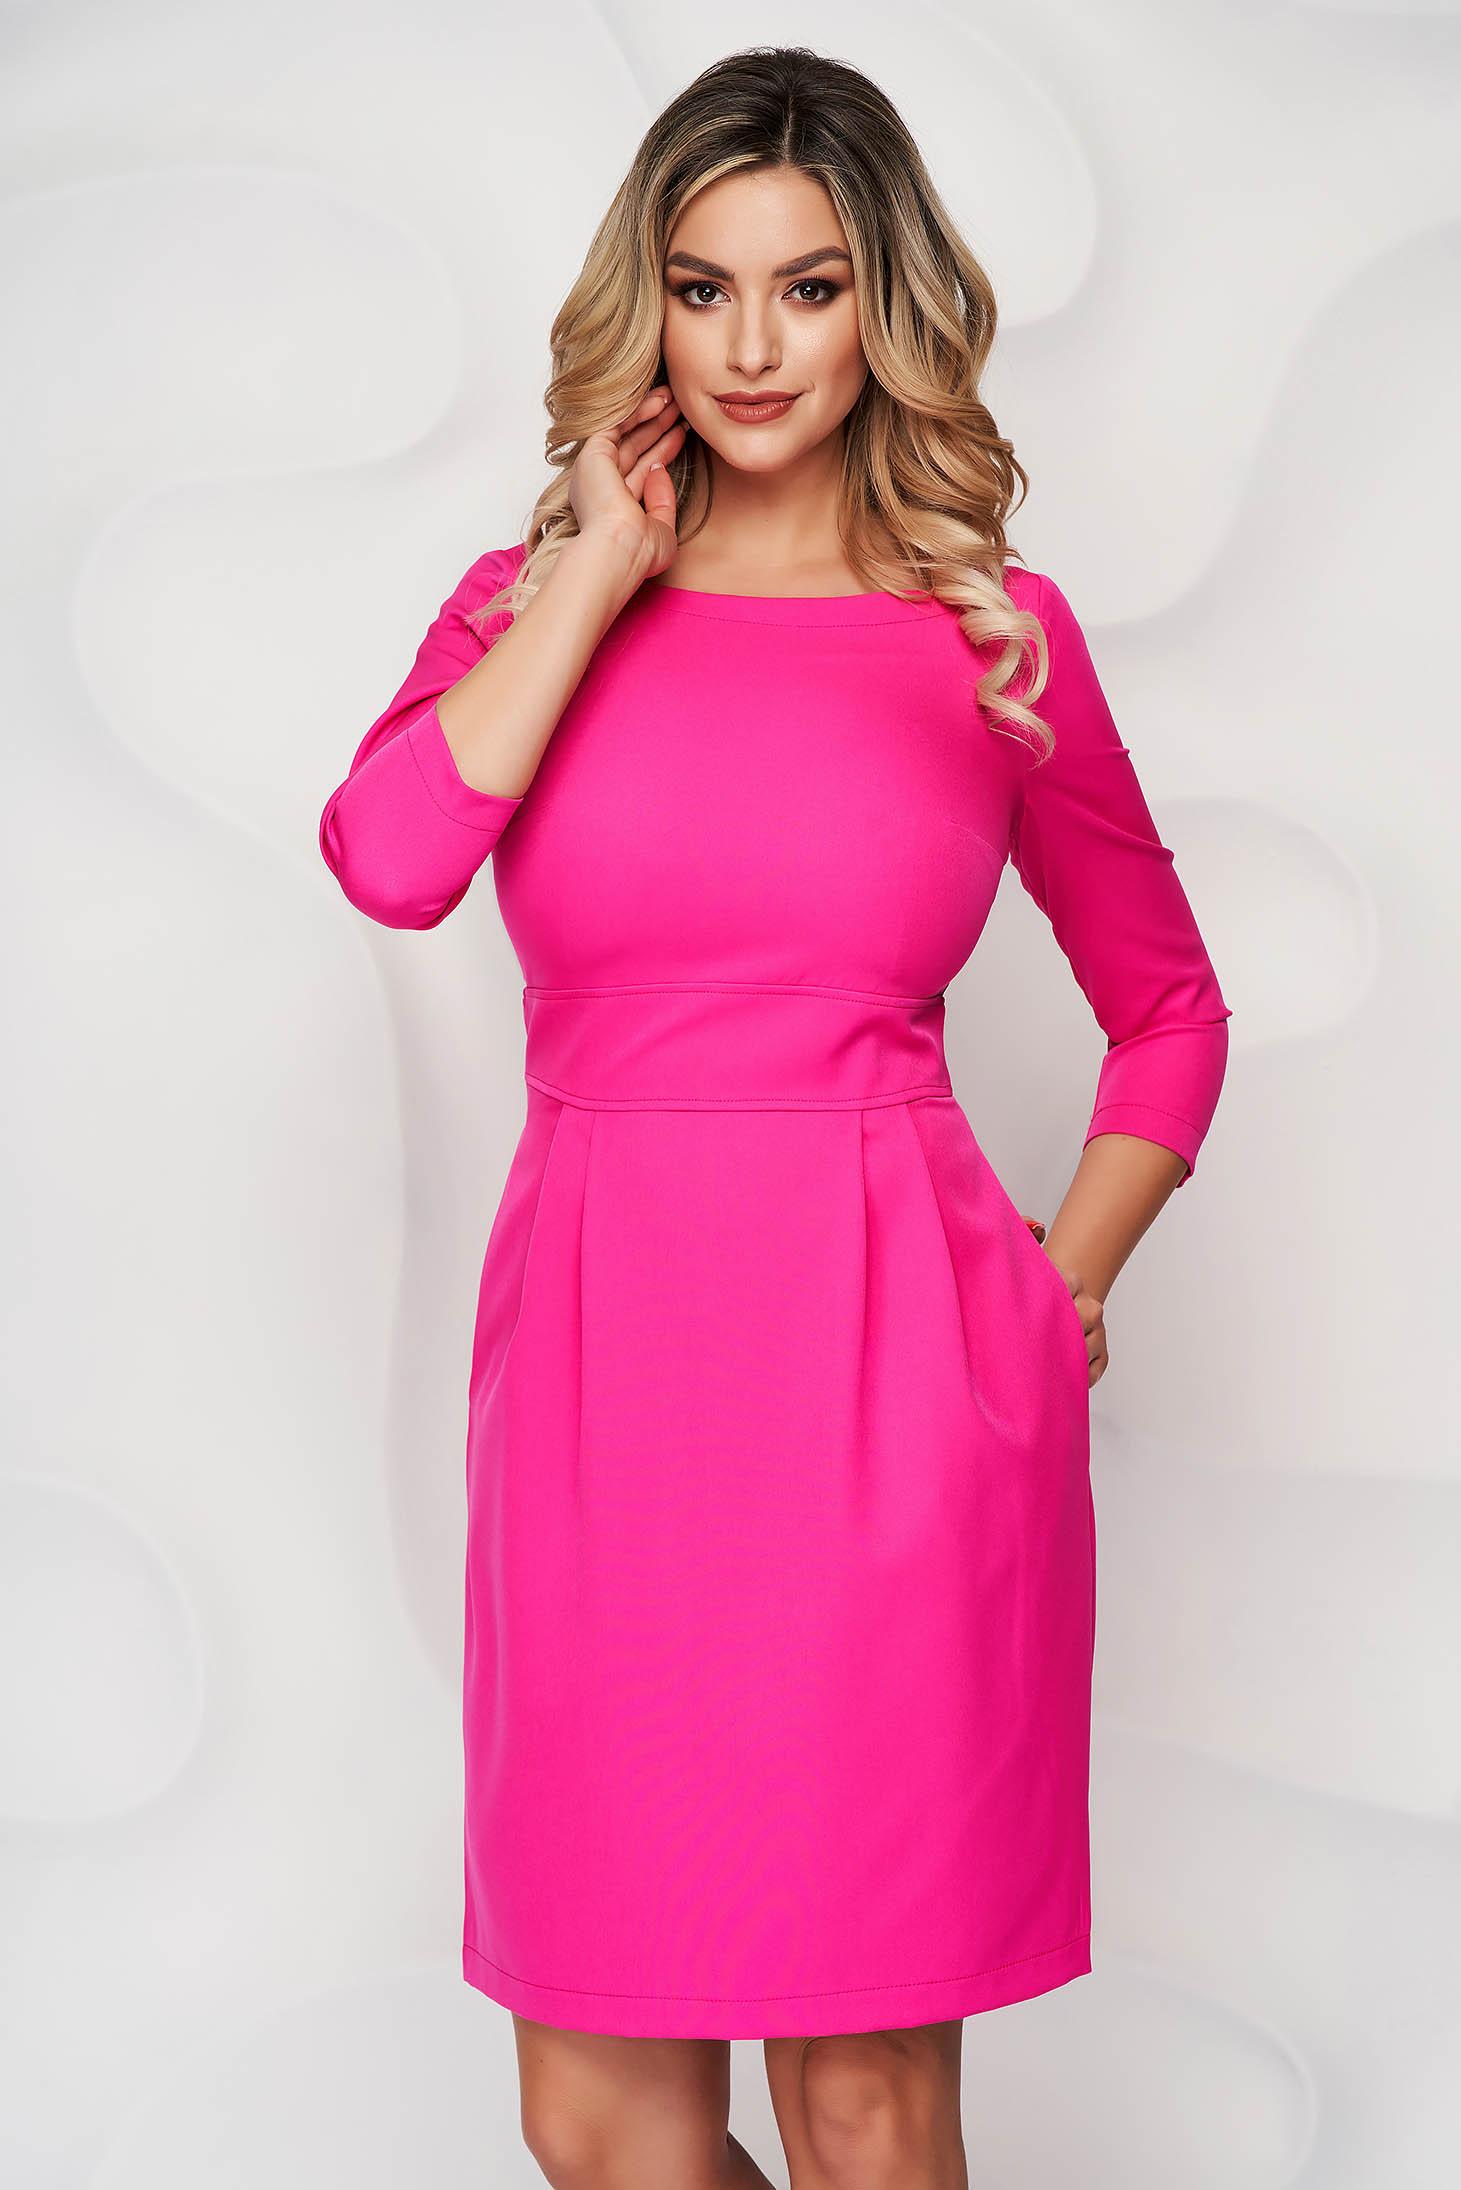 StarShinerS fuchsia office dress slightly elastic fabric with pockets short cut a-line